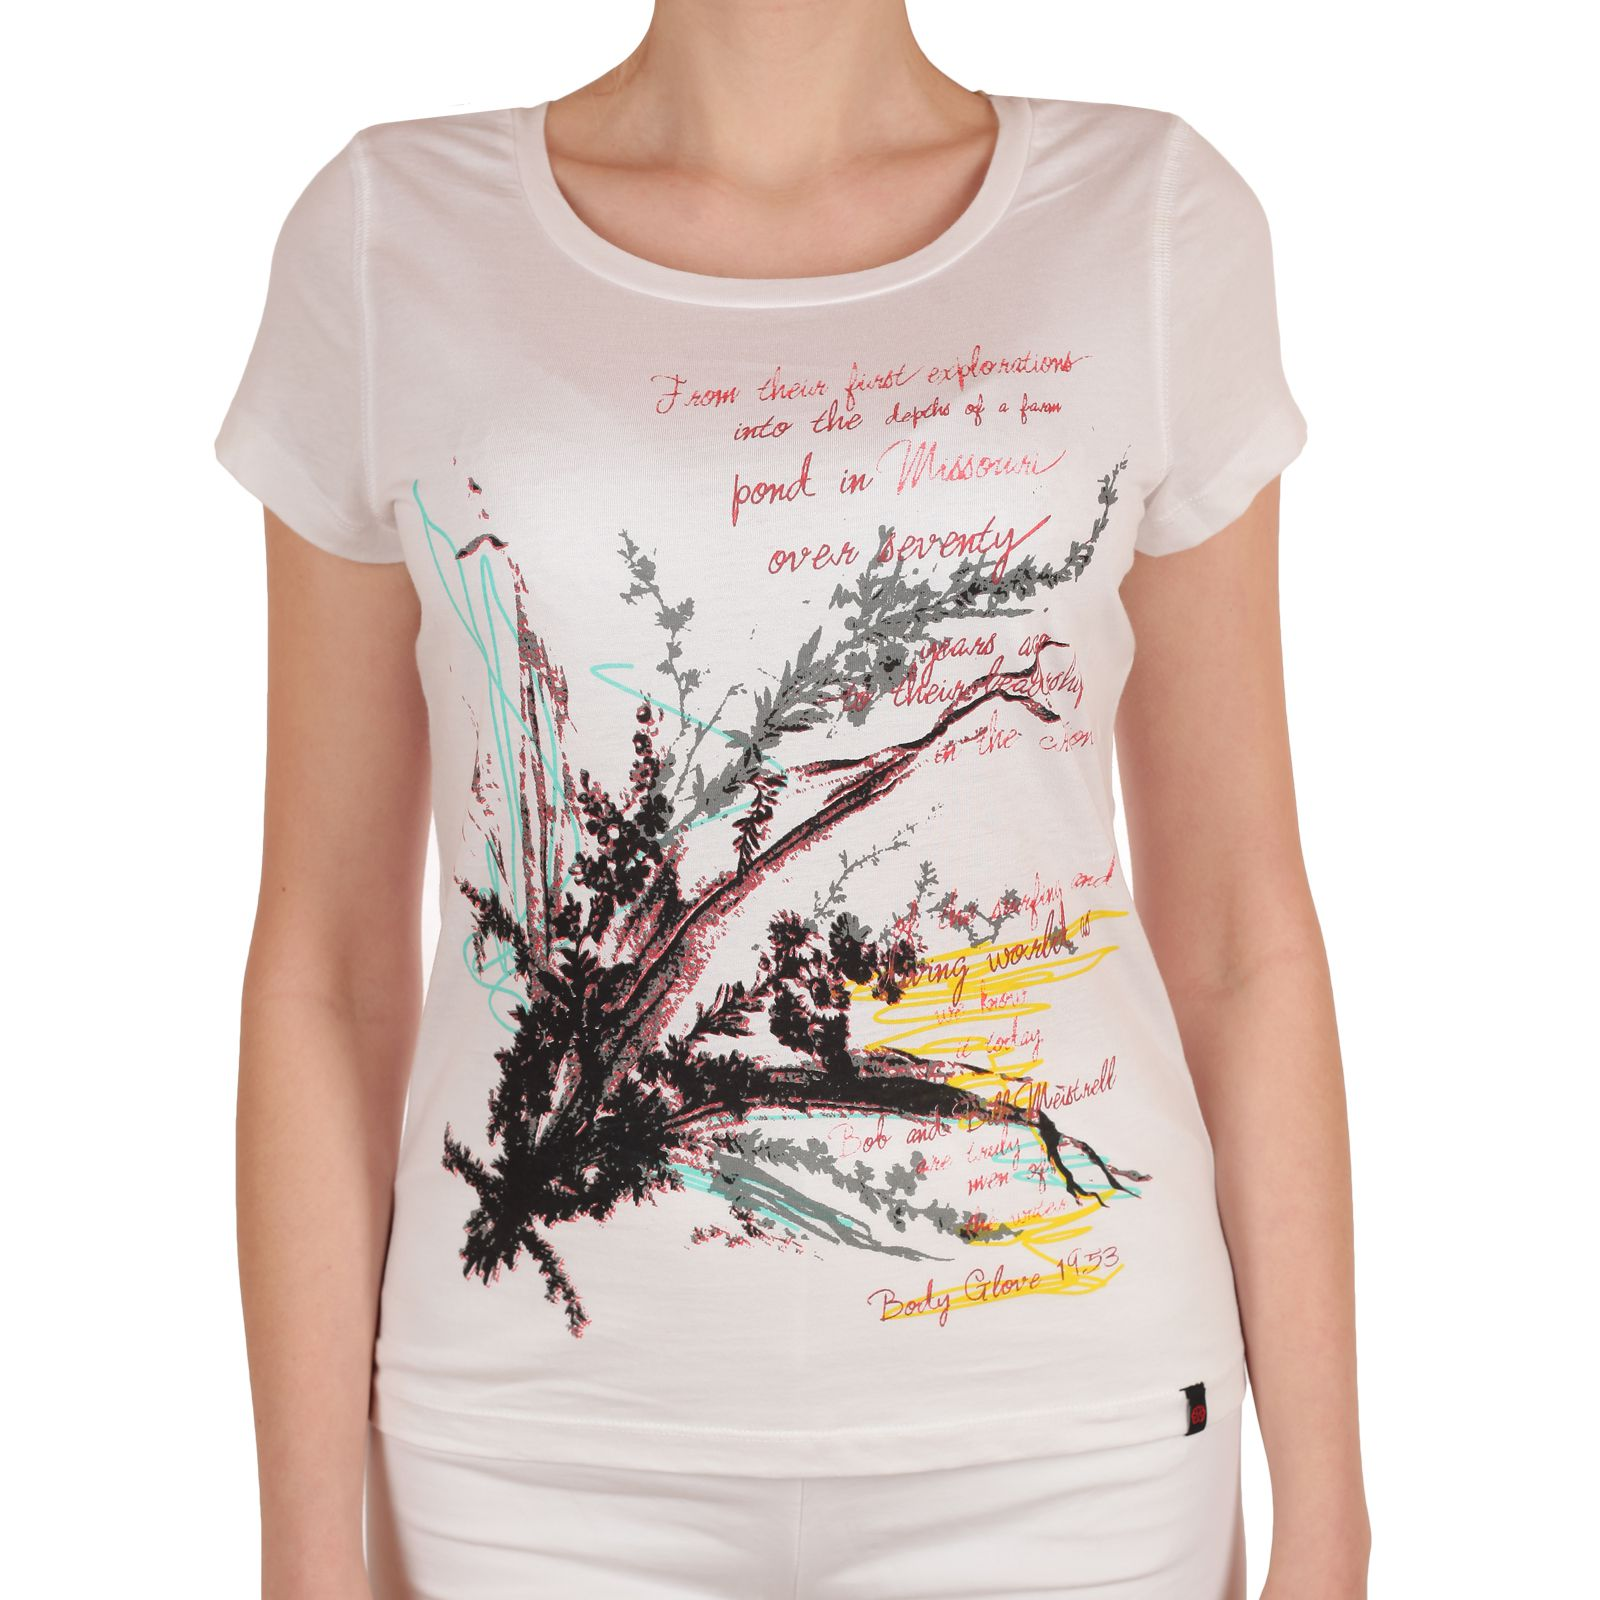 Женская элегантная футболка от Body Glove®